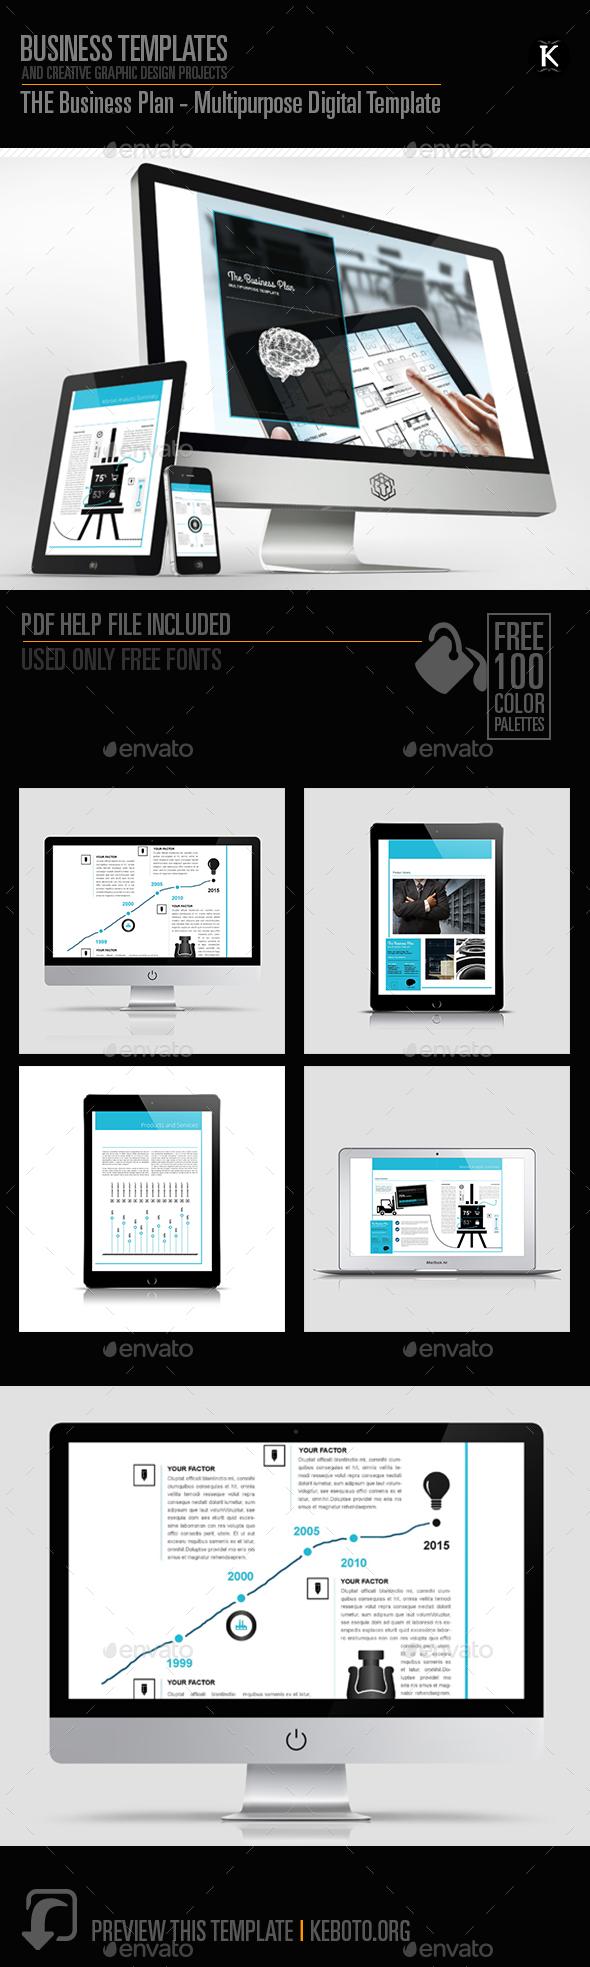 THE Business Plan - Multipurpose Digital Template - ePublishing